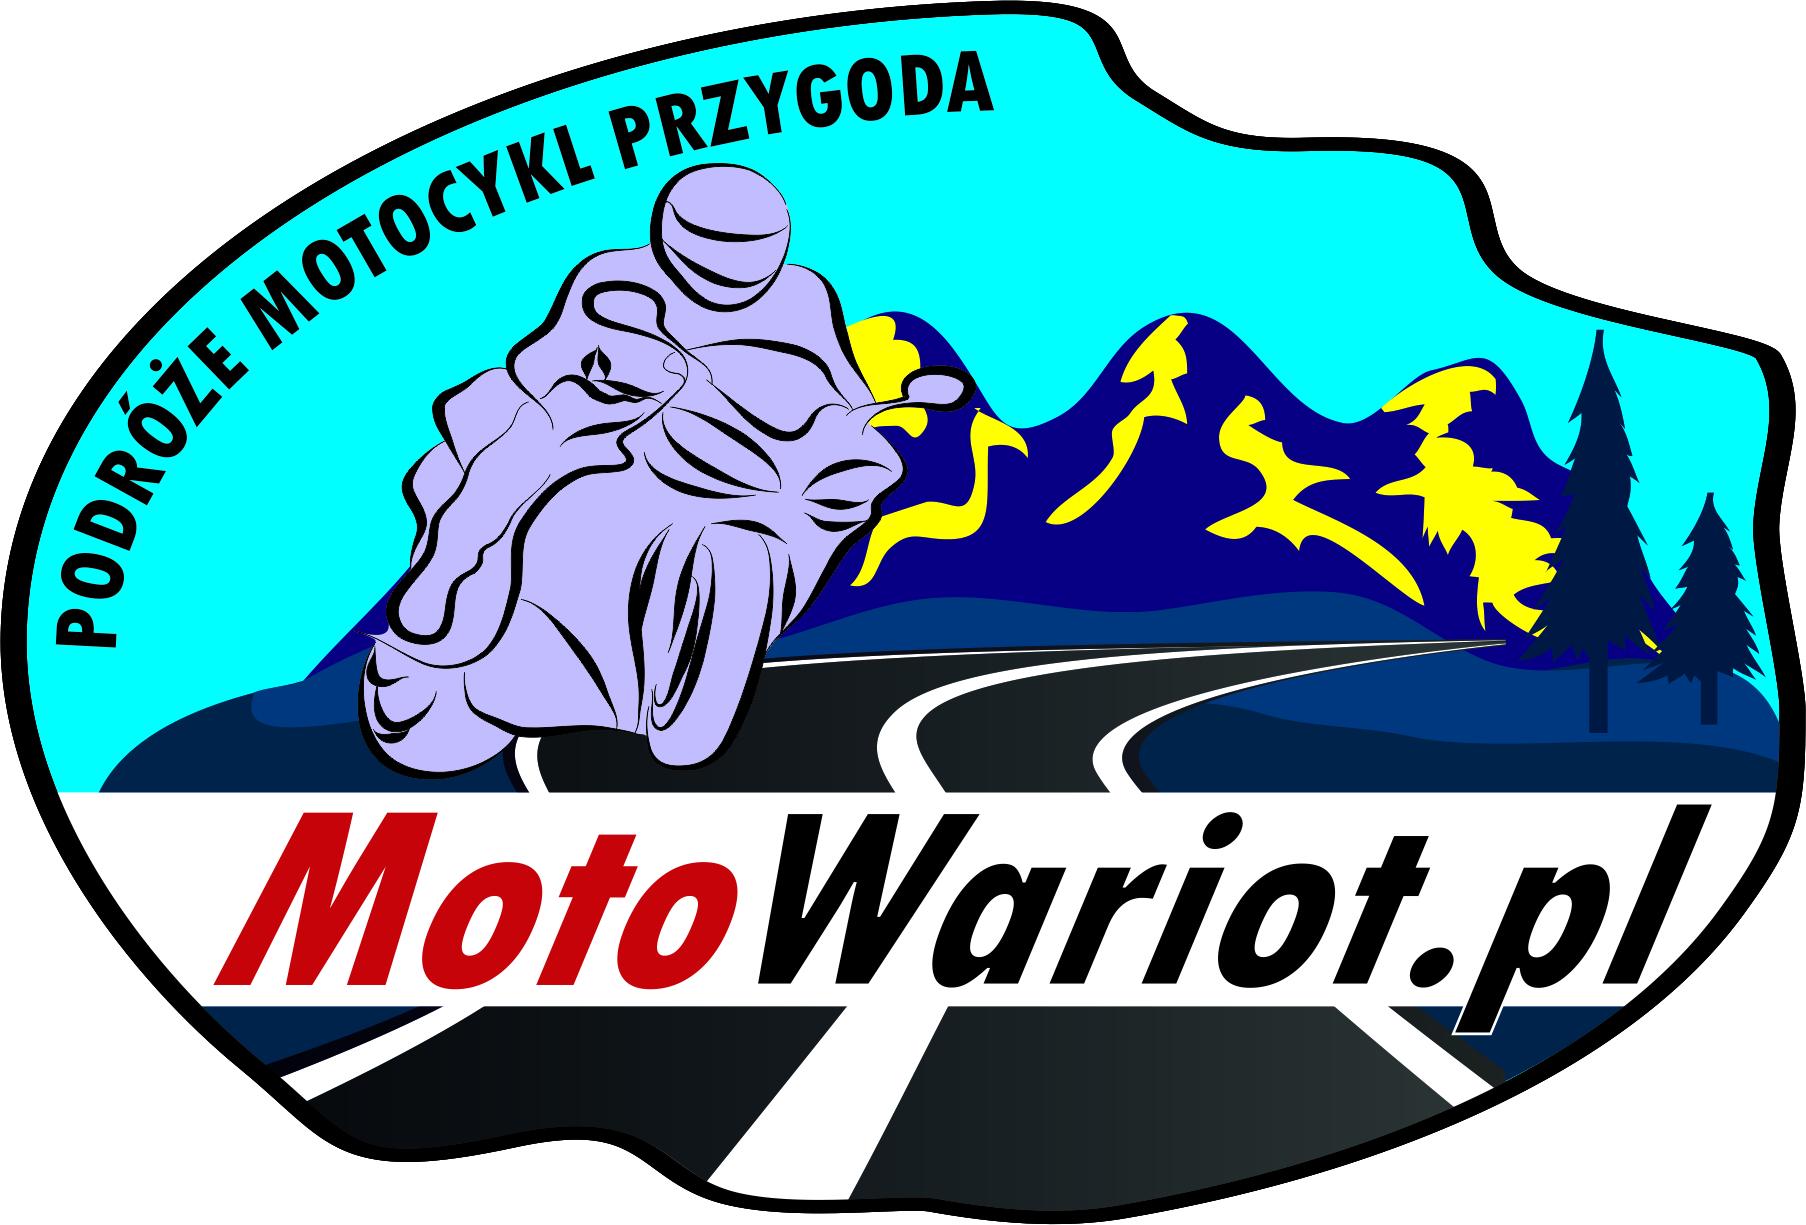 MotoWariot – podróże motocyklowe